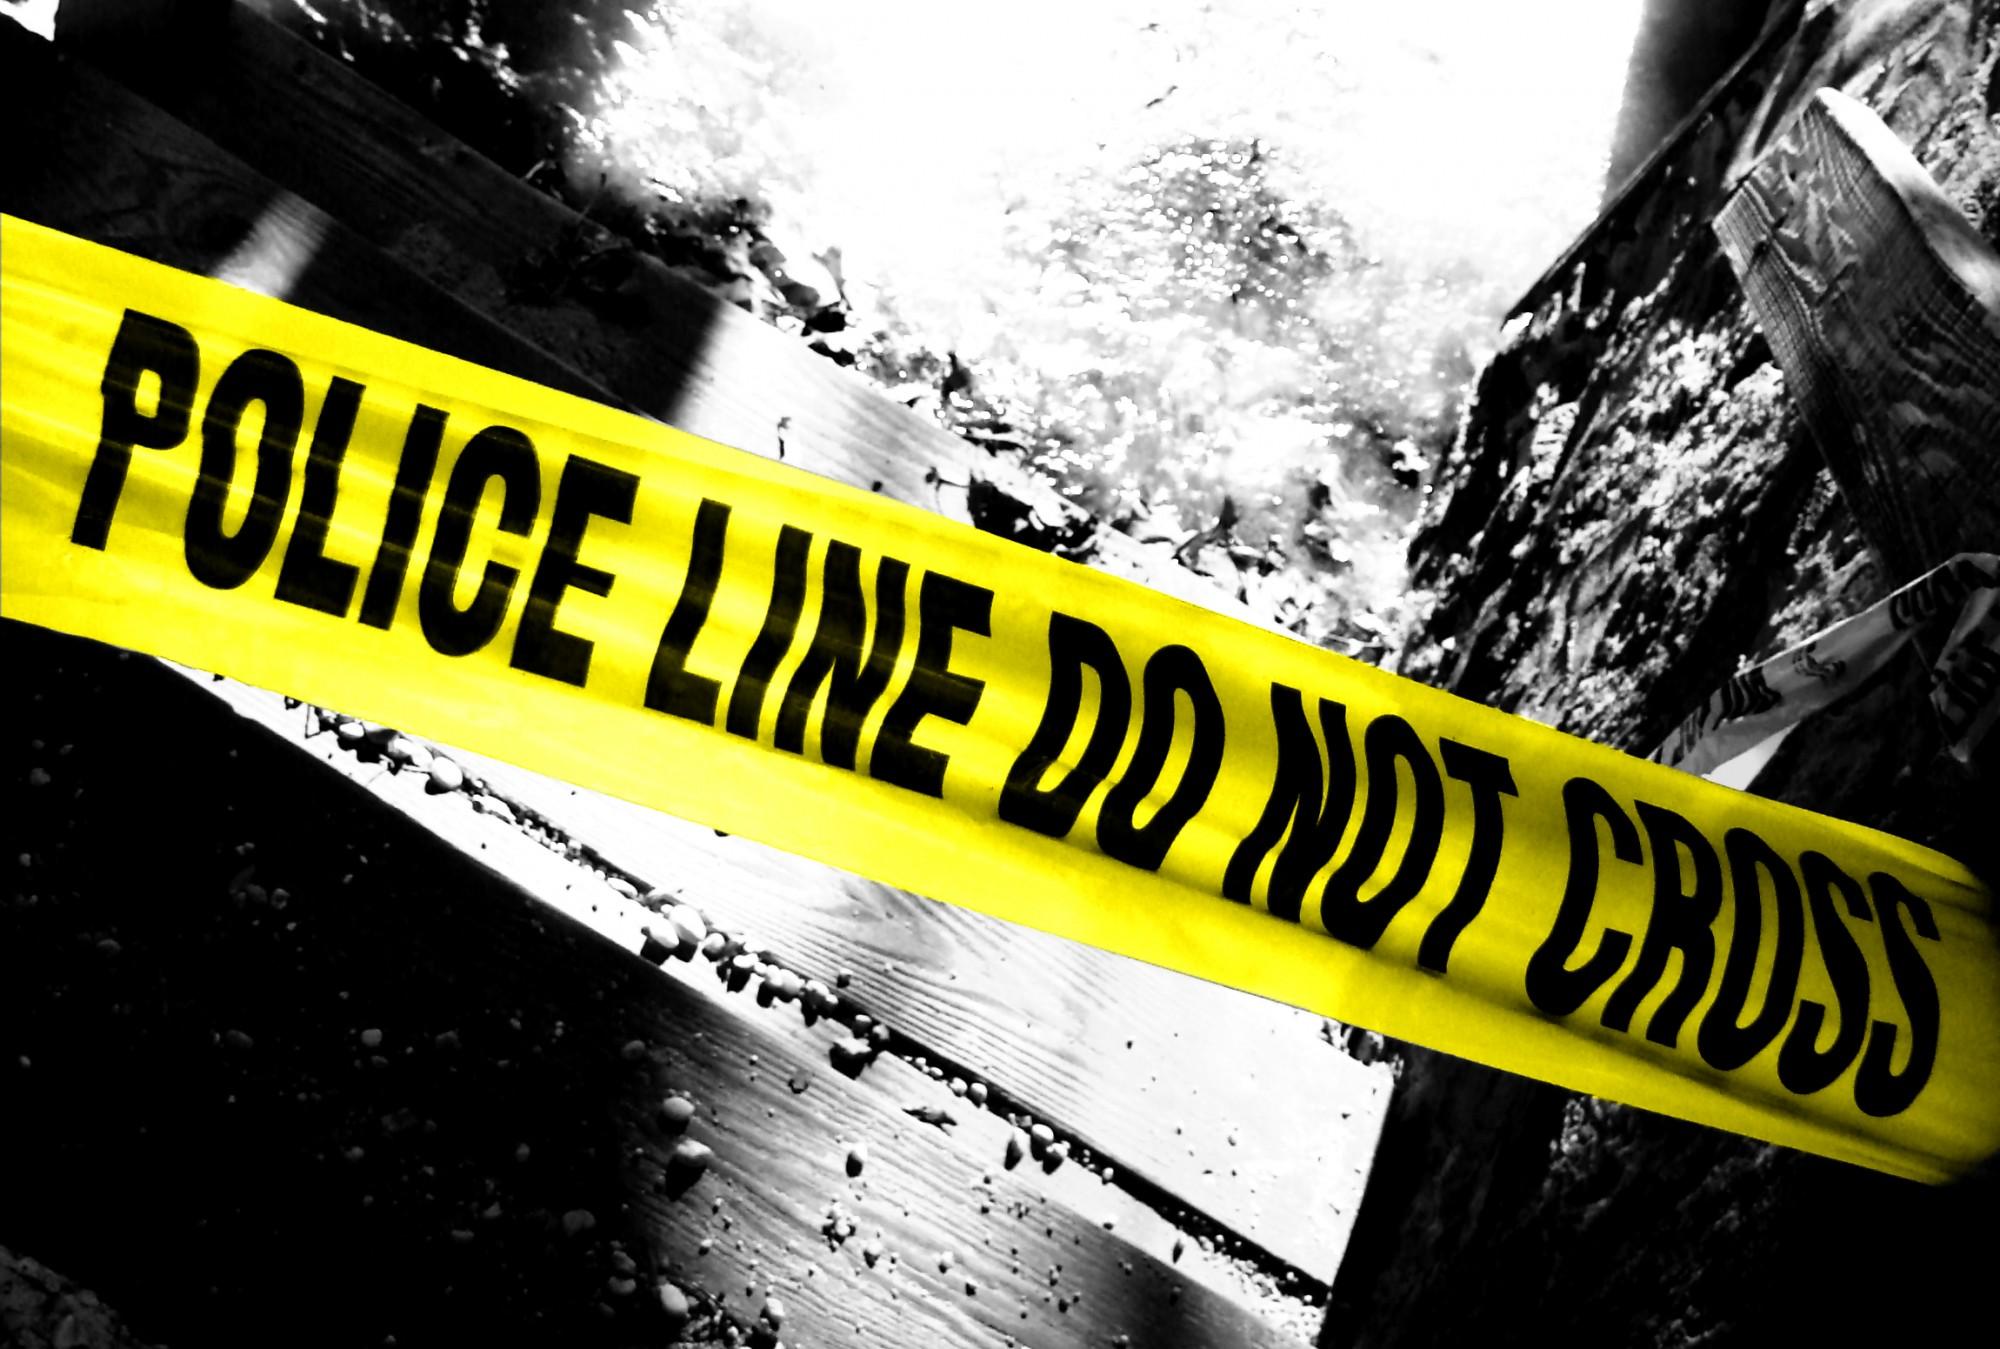 WOMAN DIES FOLLOWING WEAPONS COMPLAINT IN NORTHEAST EDMONTON